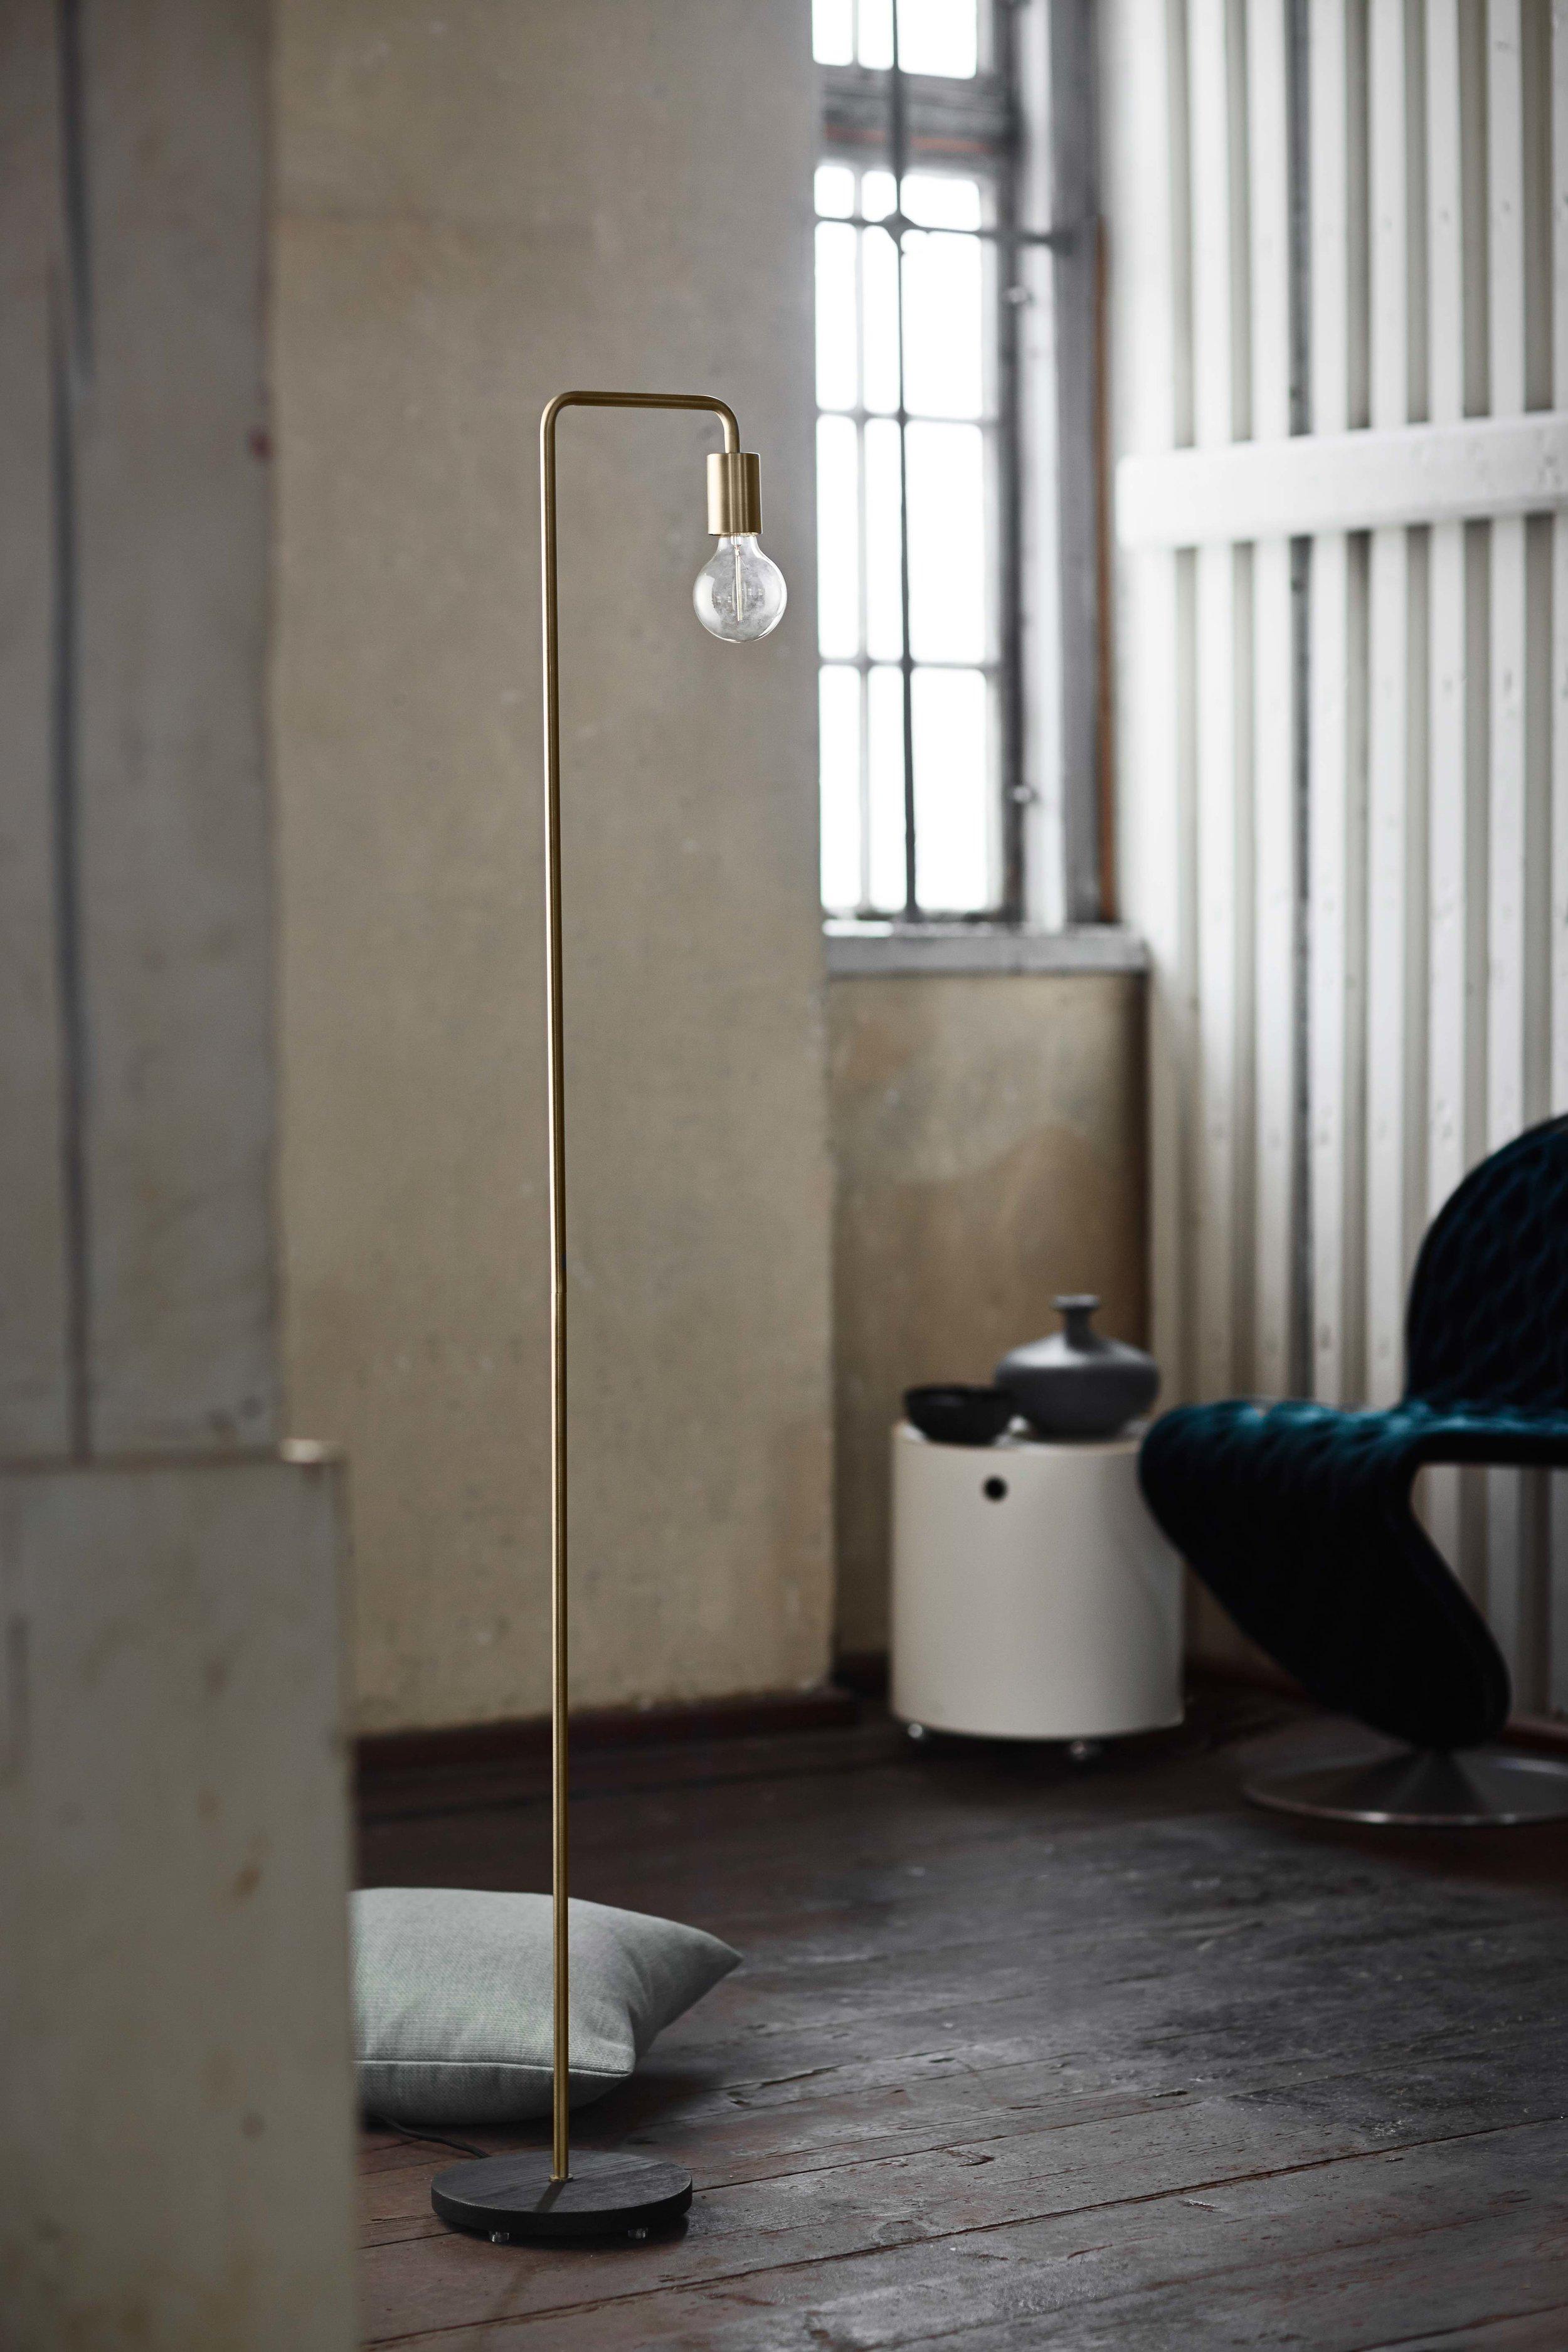 Cool-floor---antique-brass---Lifestyle---Randers.jpg